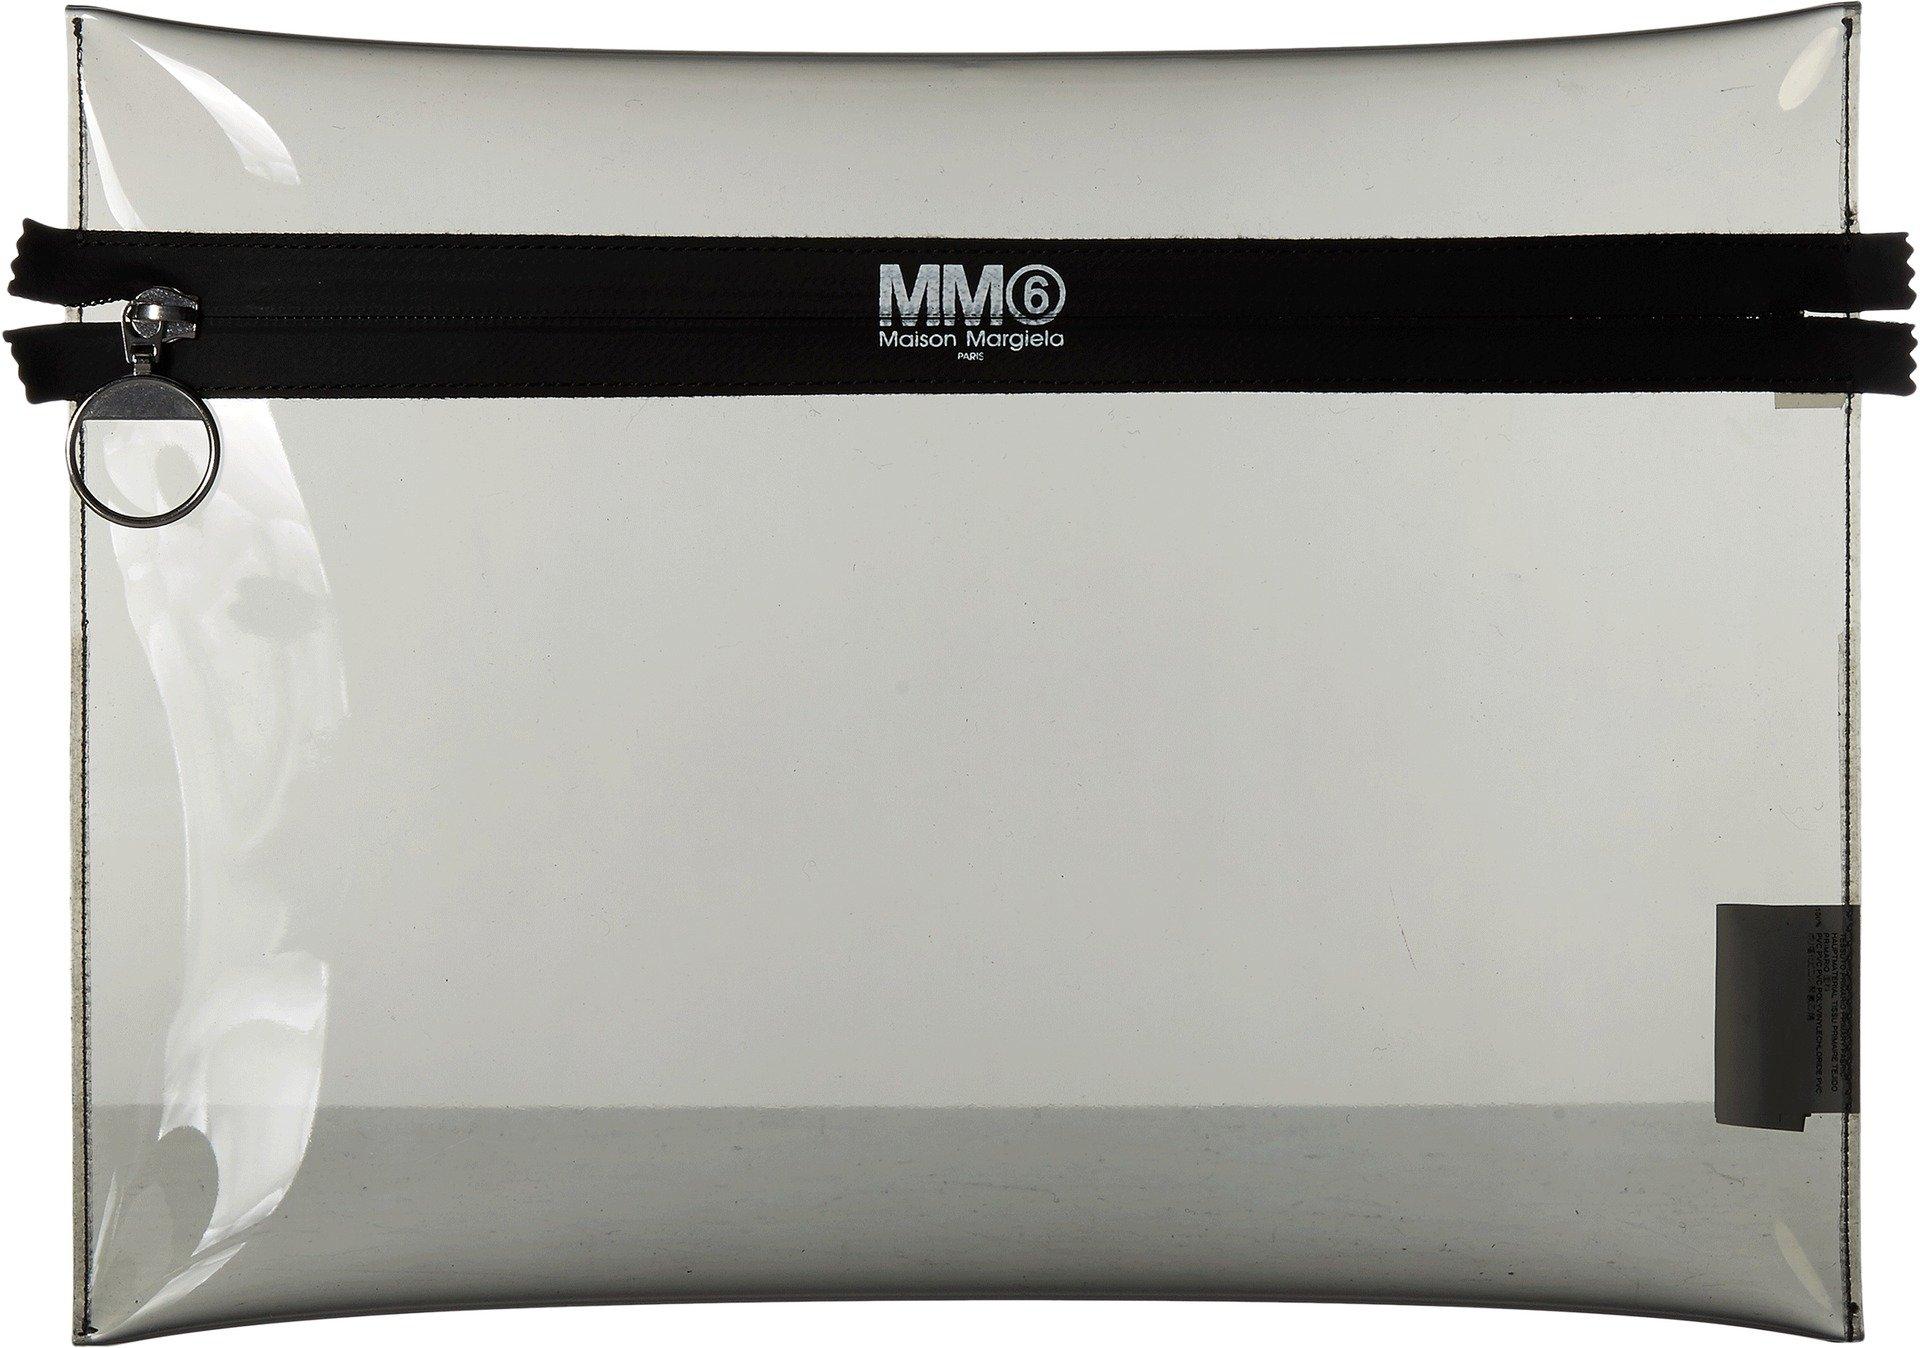 MM6 Maison Margiela Women's Large Pouch Dark Grey